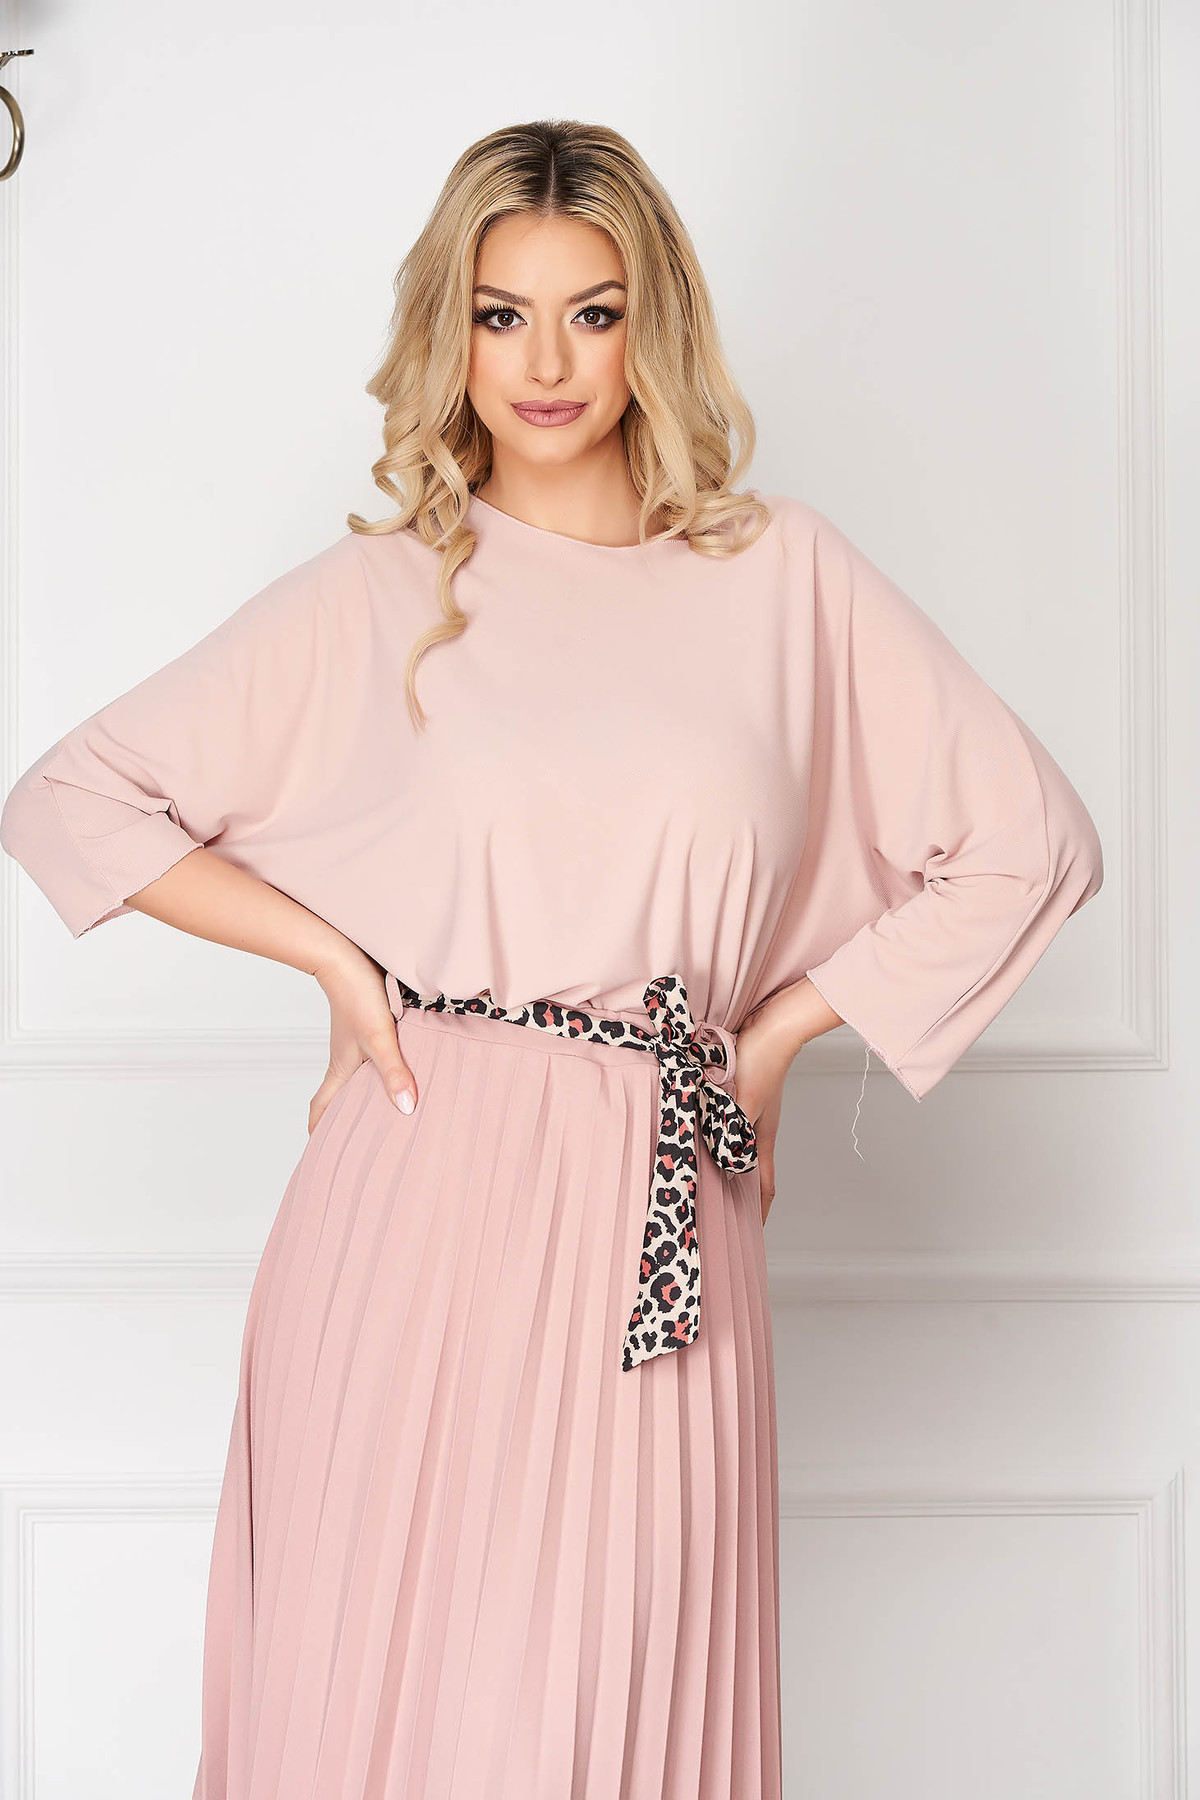 Bluza dama SunShine roz prafuit casual scurta asimetrica din bumbac cu croi larg